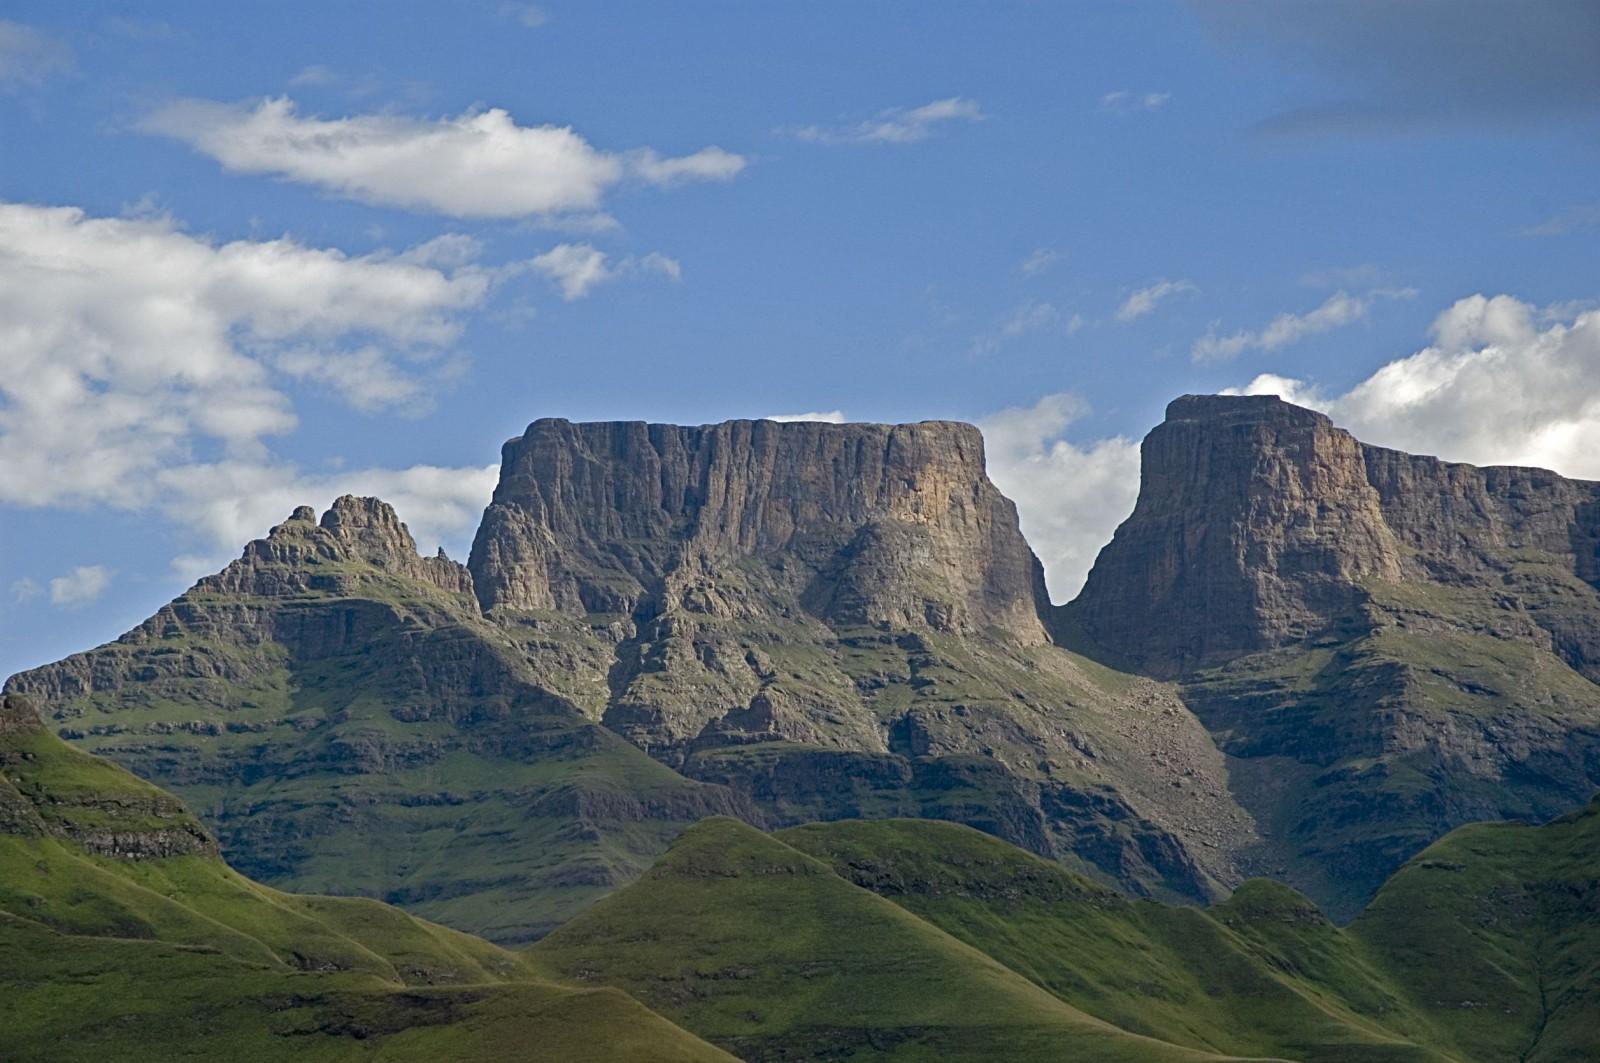 South Africa, Drakensberg Moutain